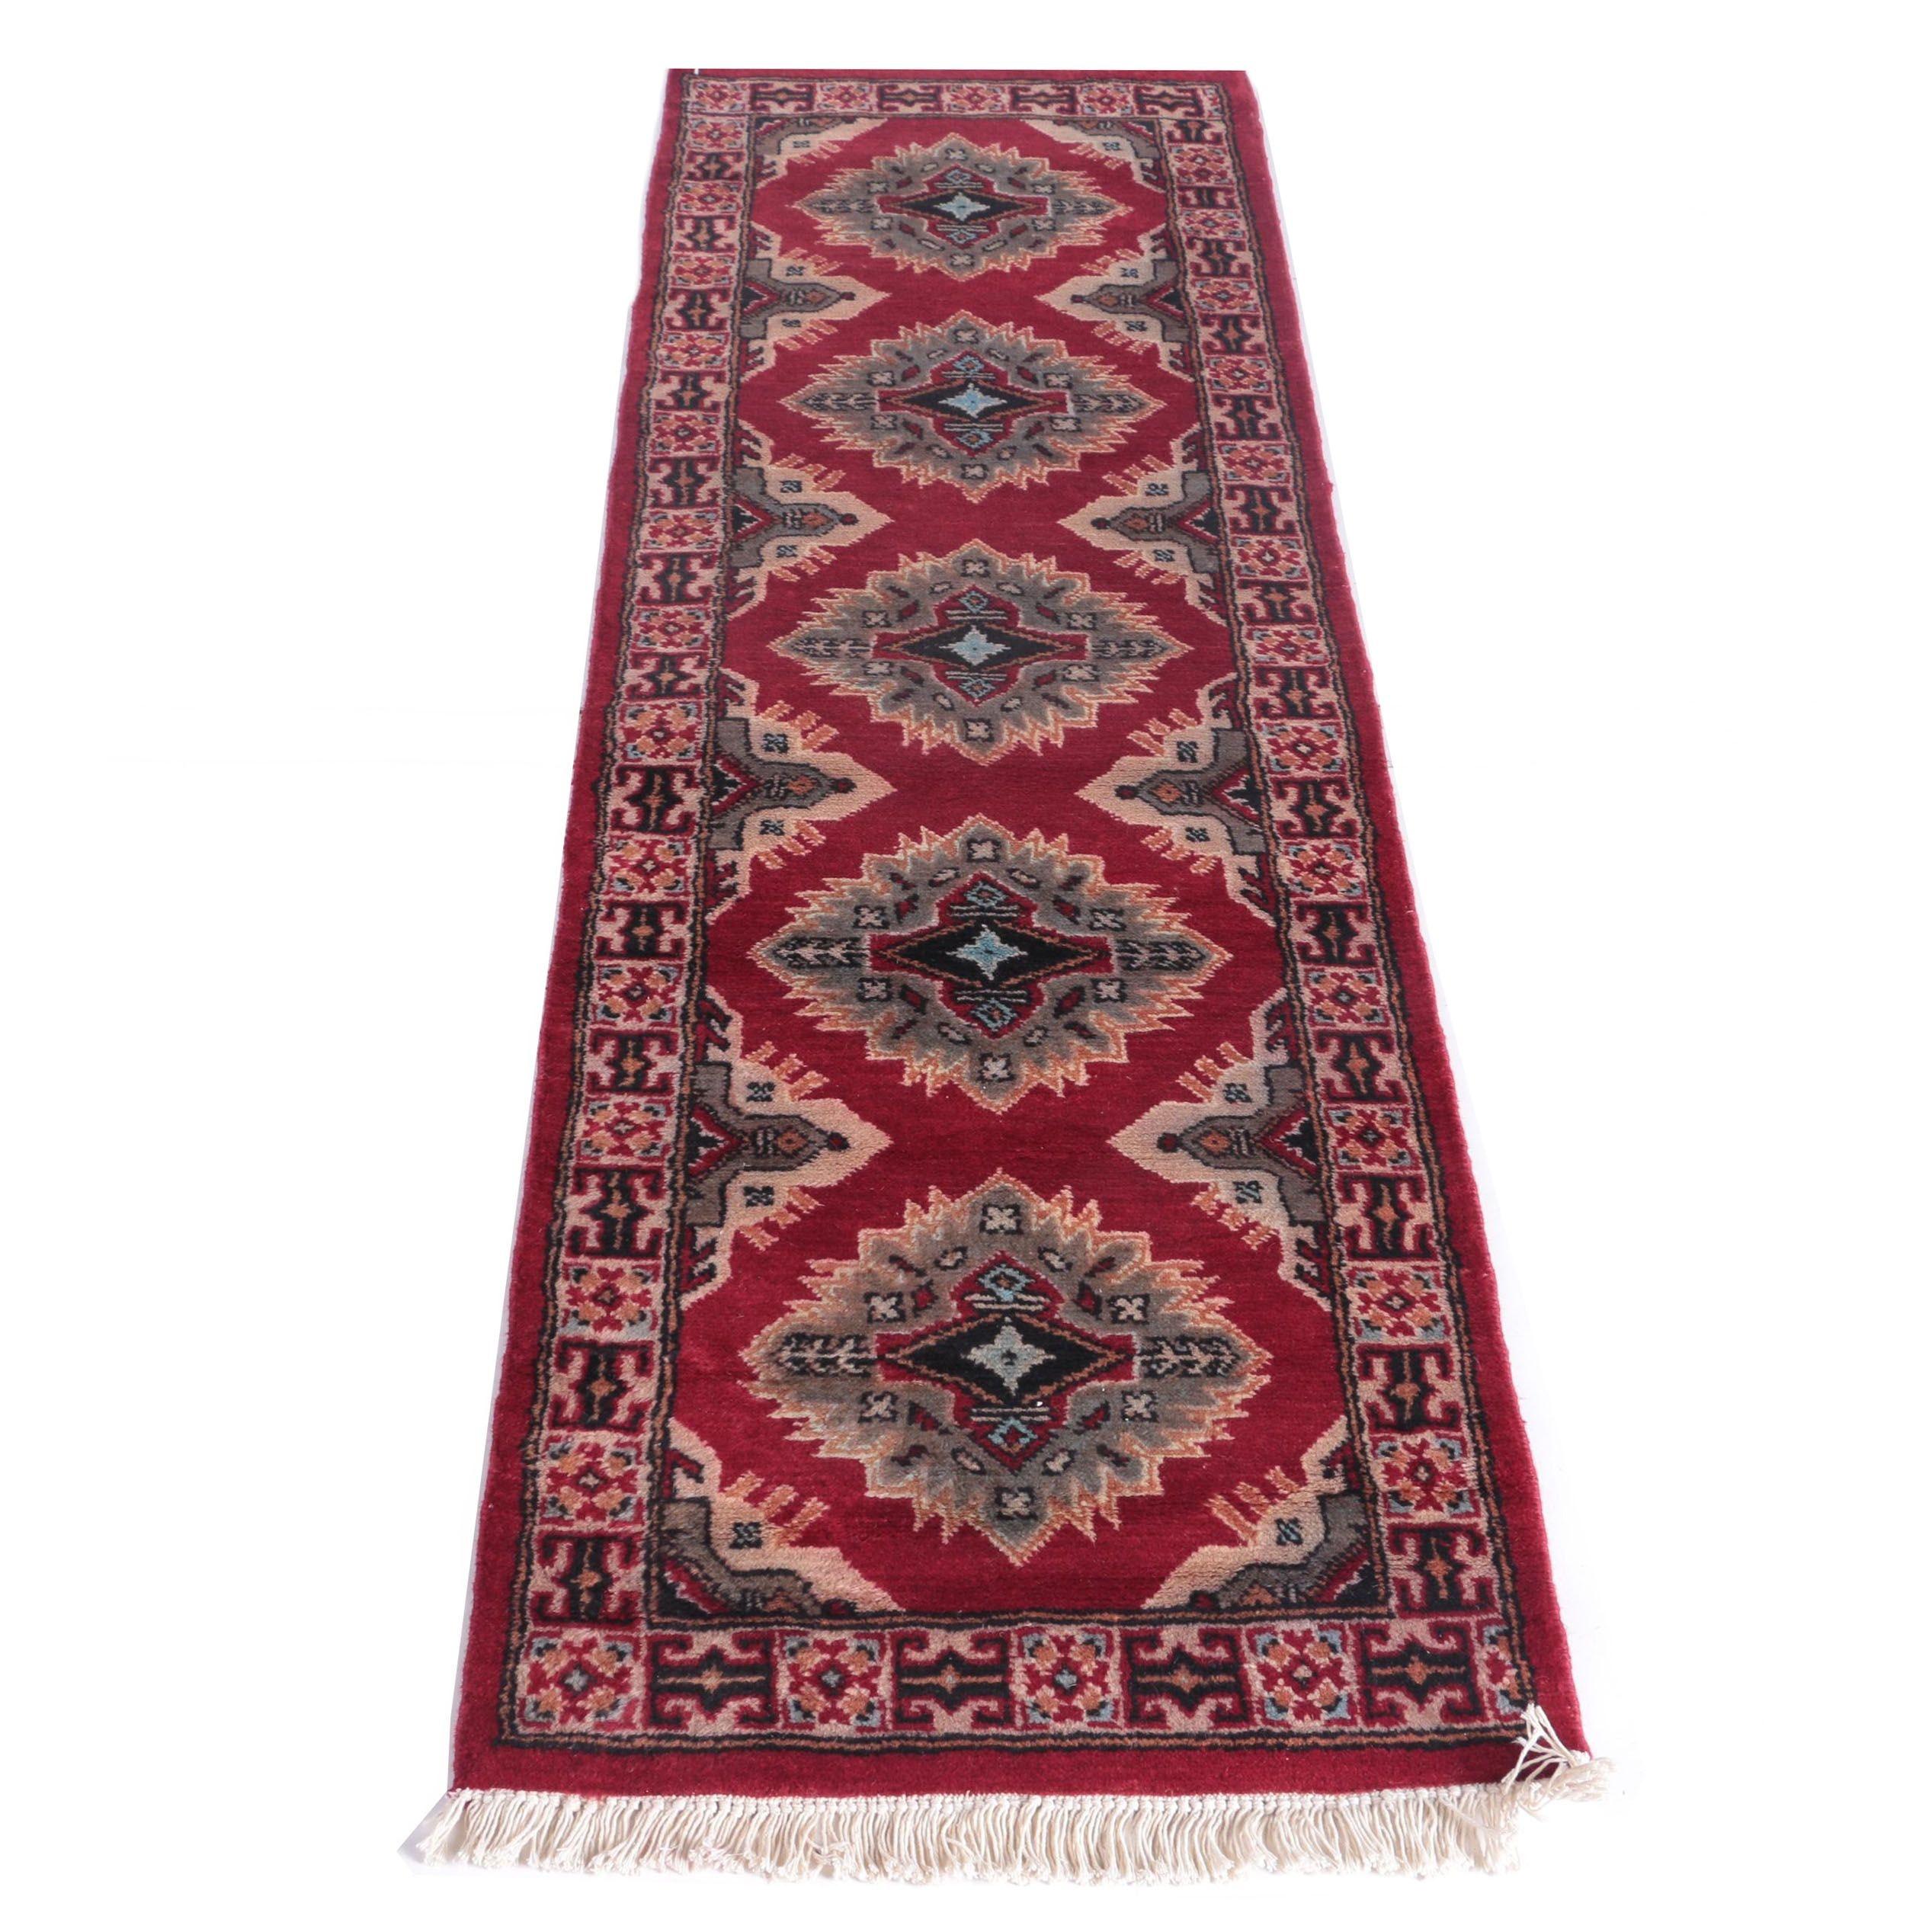 Hand-Knotted Indo-Kazak Carpet Runner